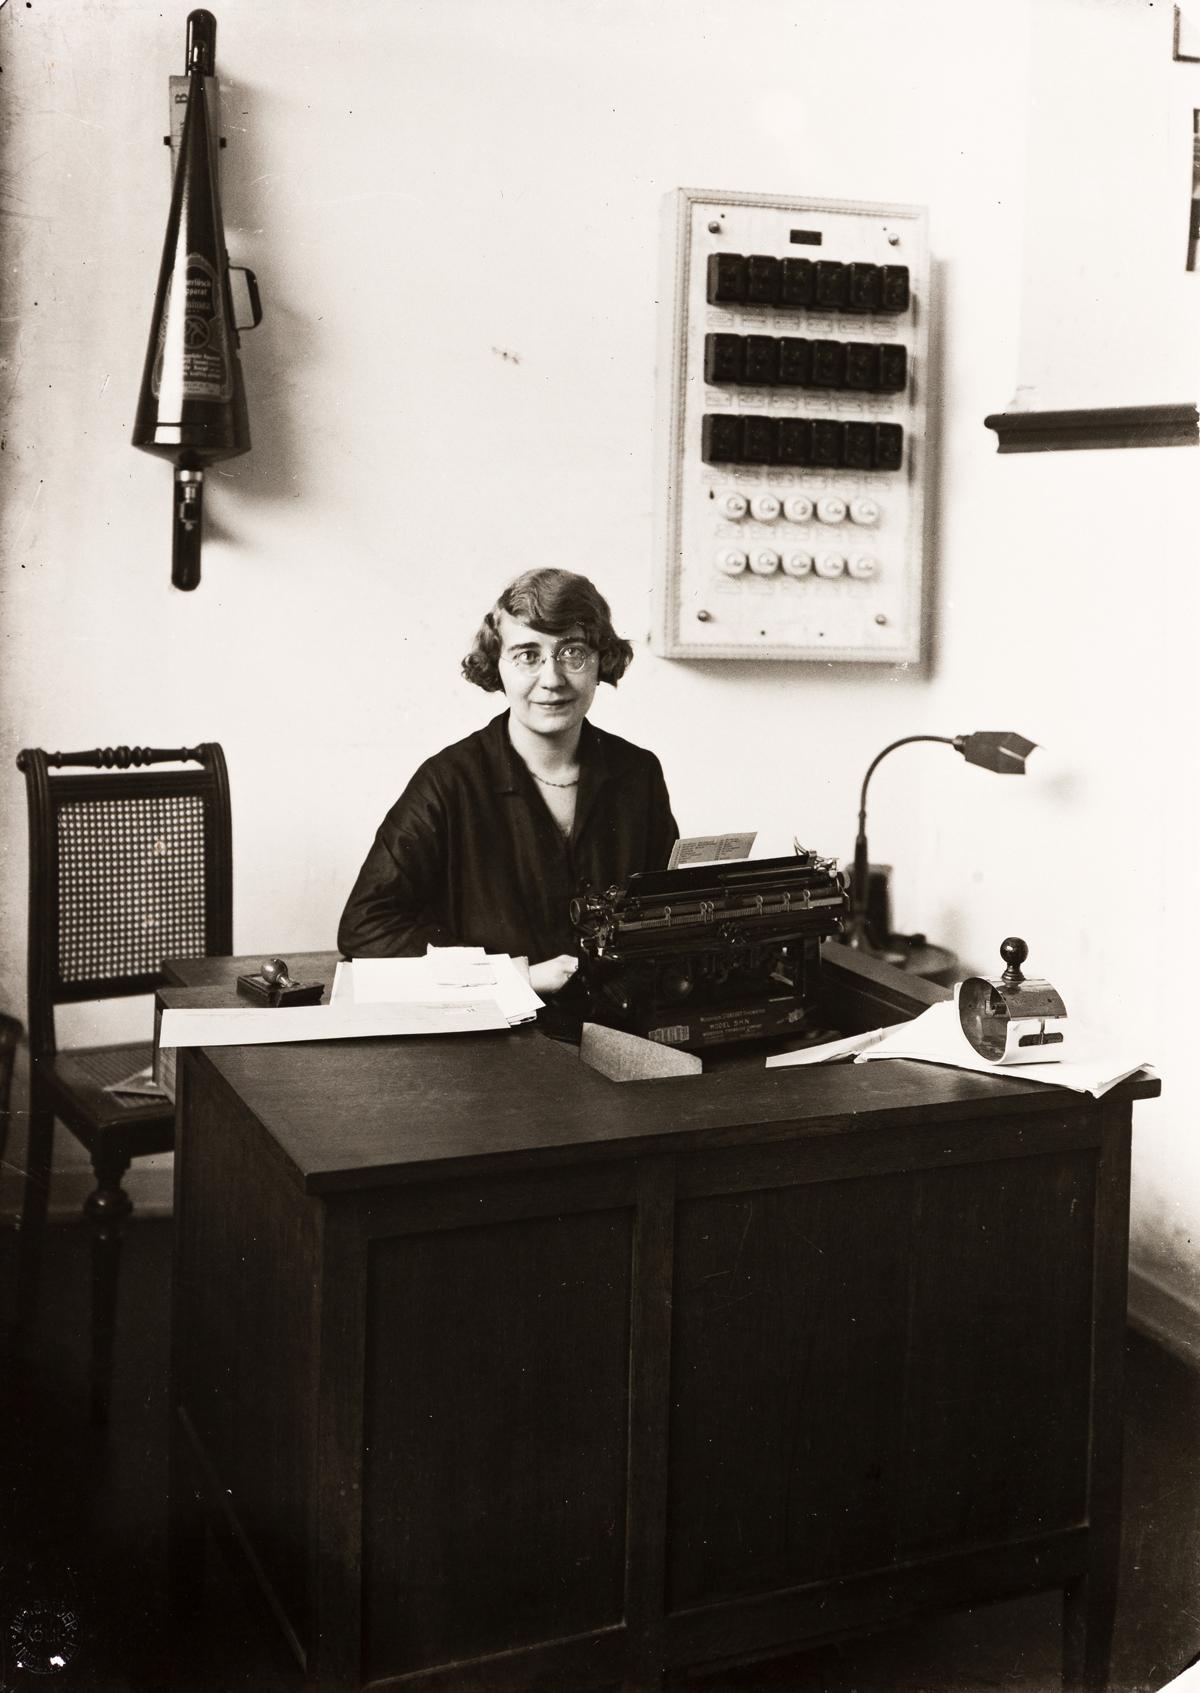 AUGUST SANDER (1876-1964)/GUNTHER SANDER (1907-1987) Shorthand-typist at a Savings Bank, Köln.